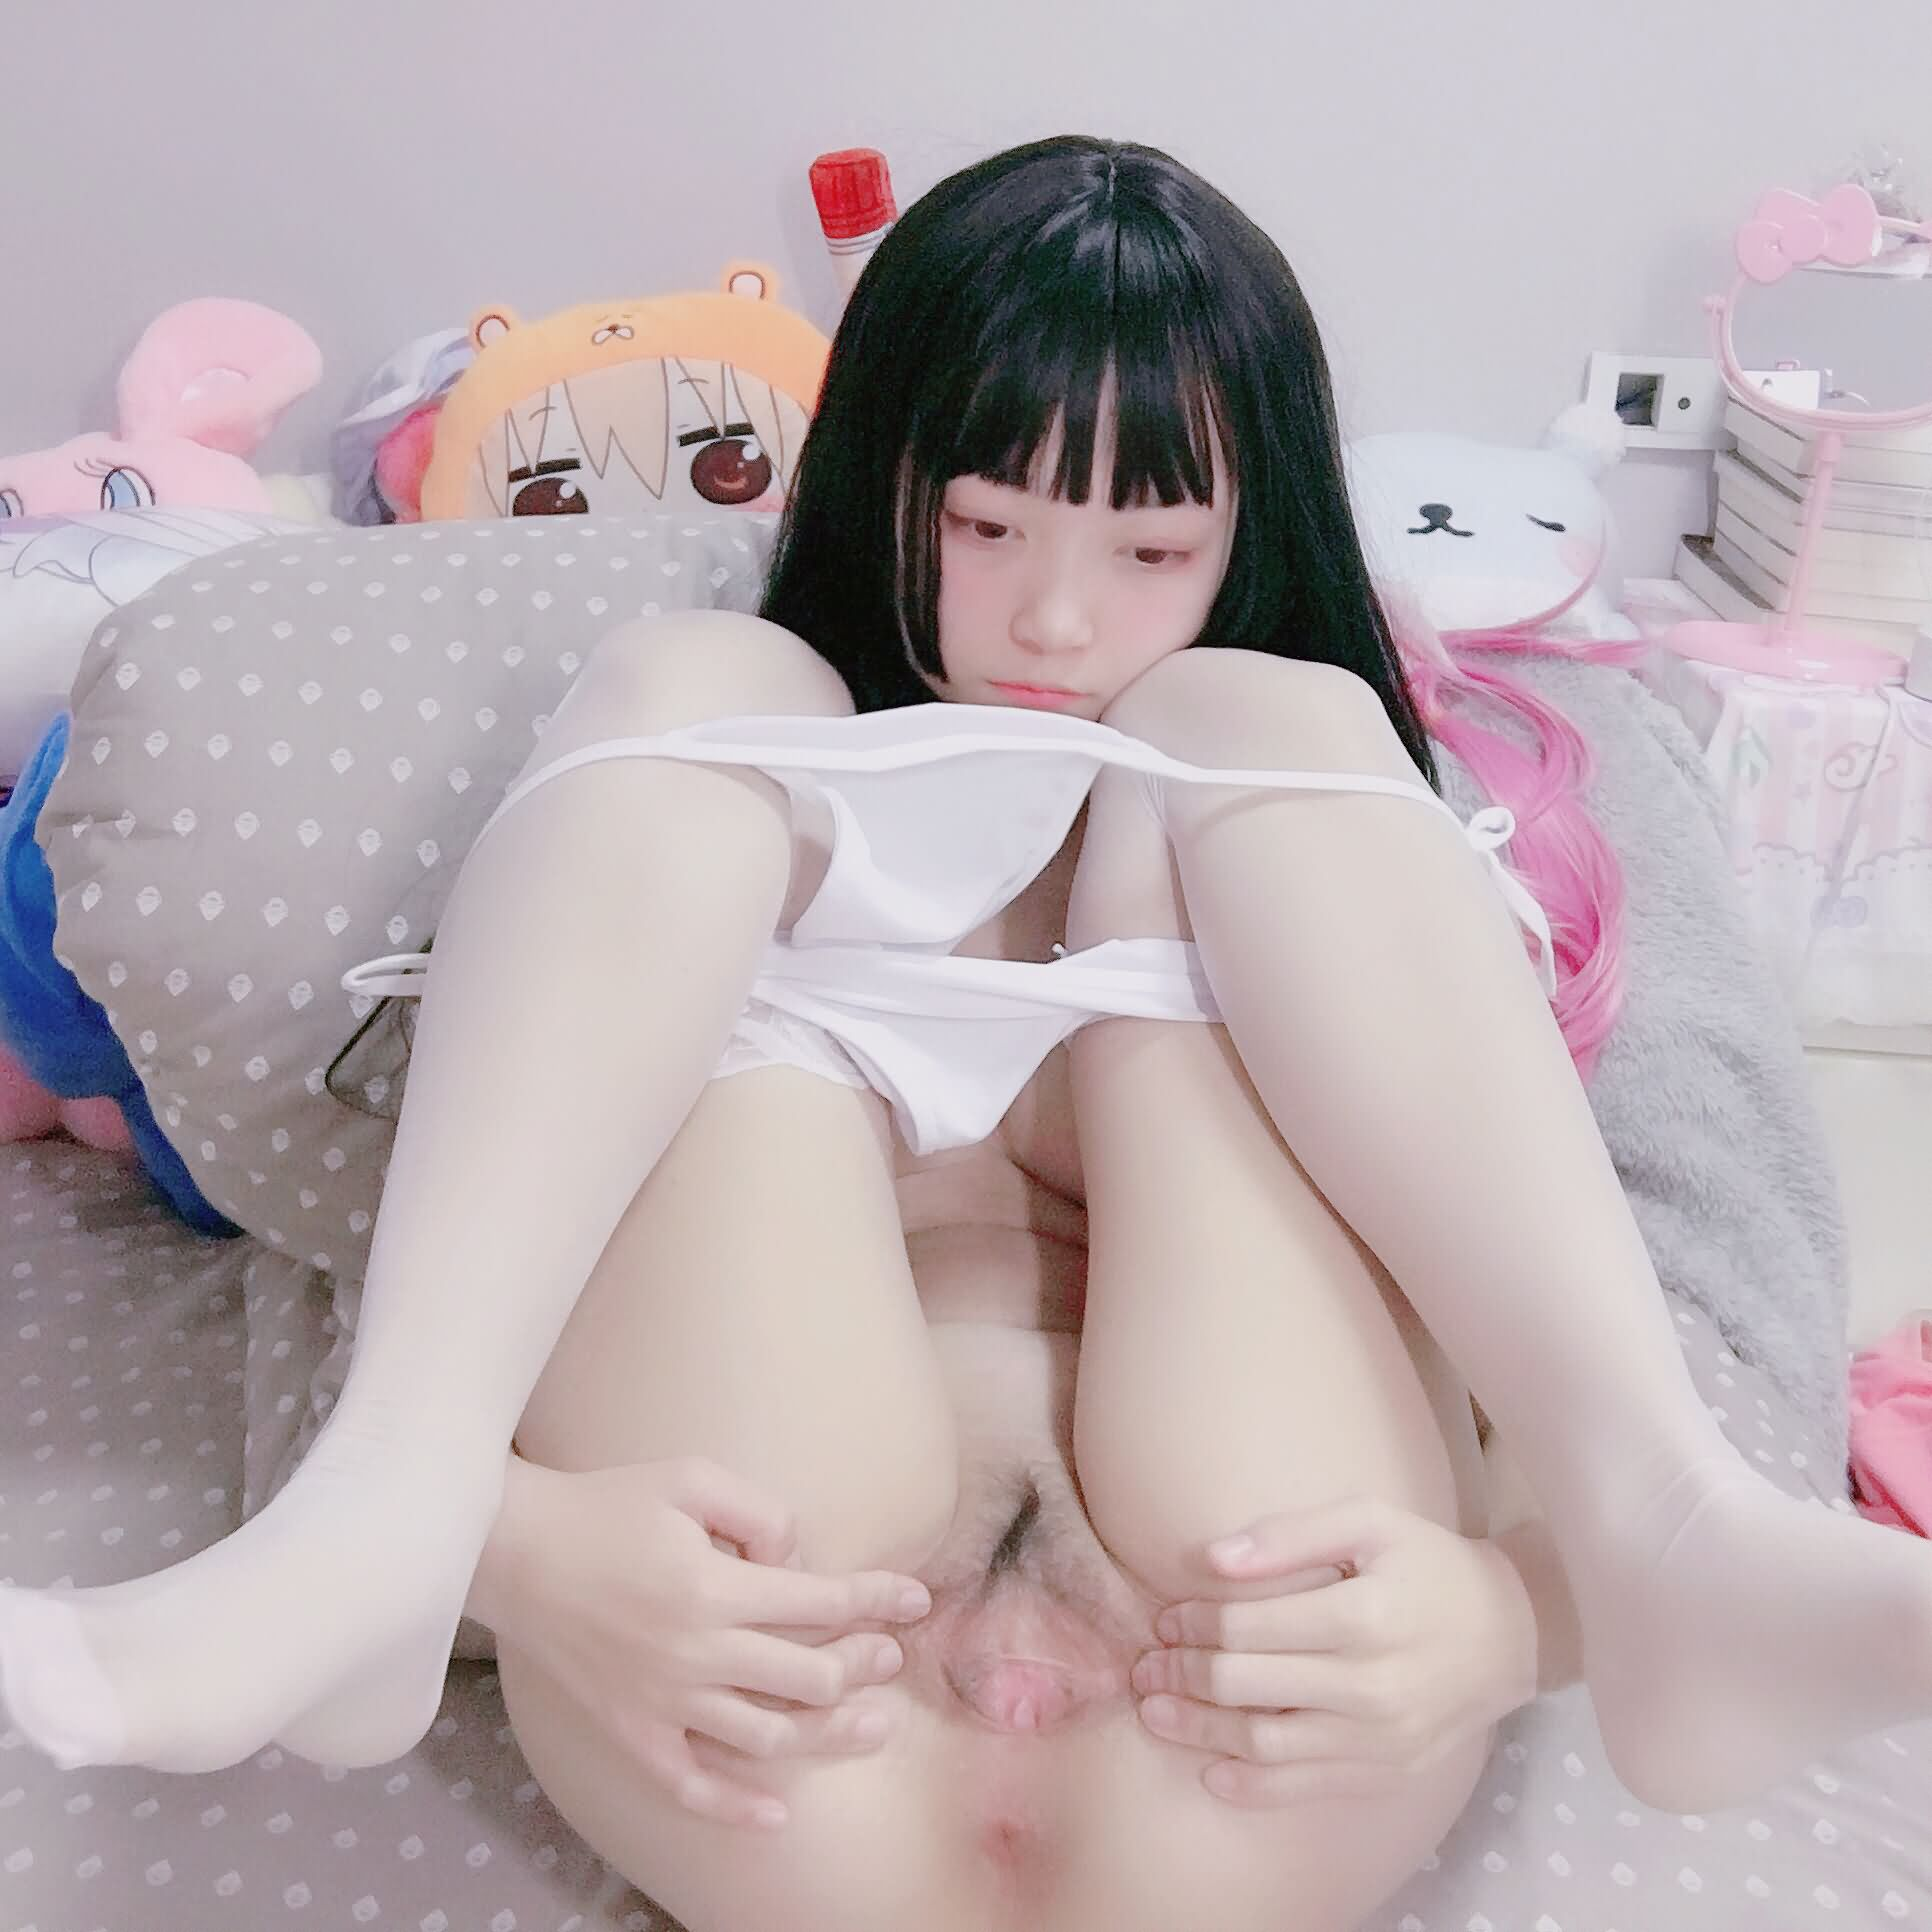 Jq4ziR - Preview: Cute kitten in black stockings (25P)